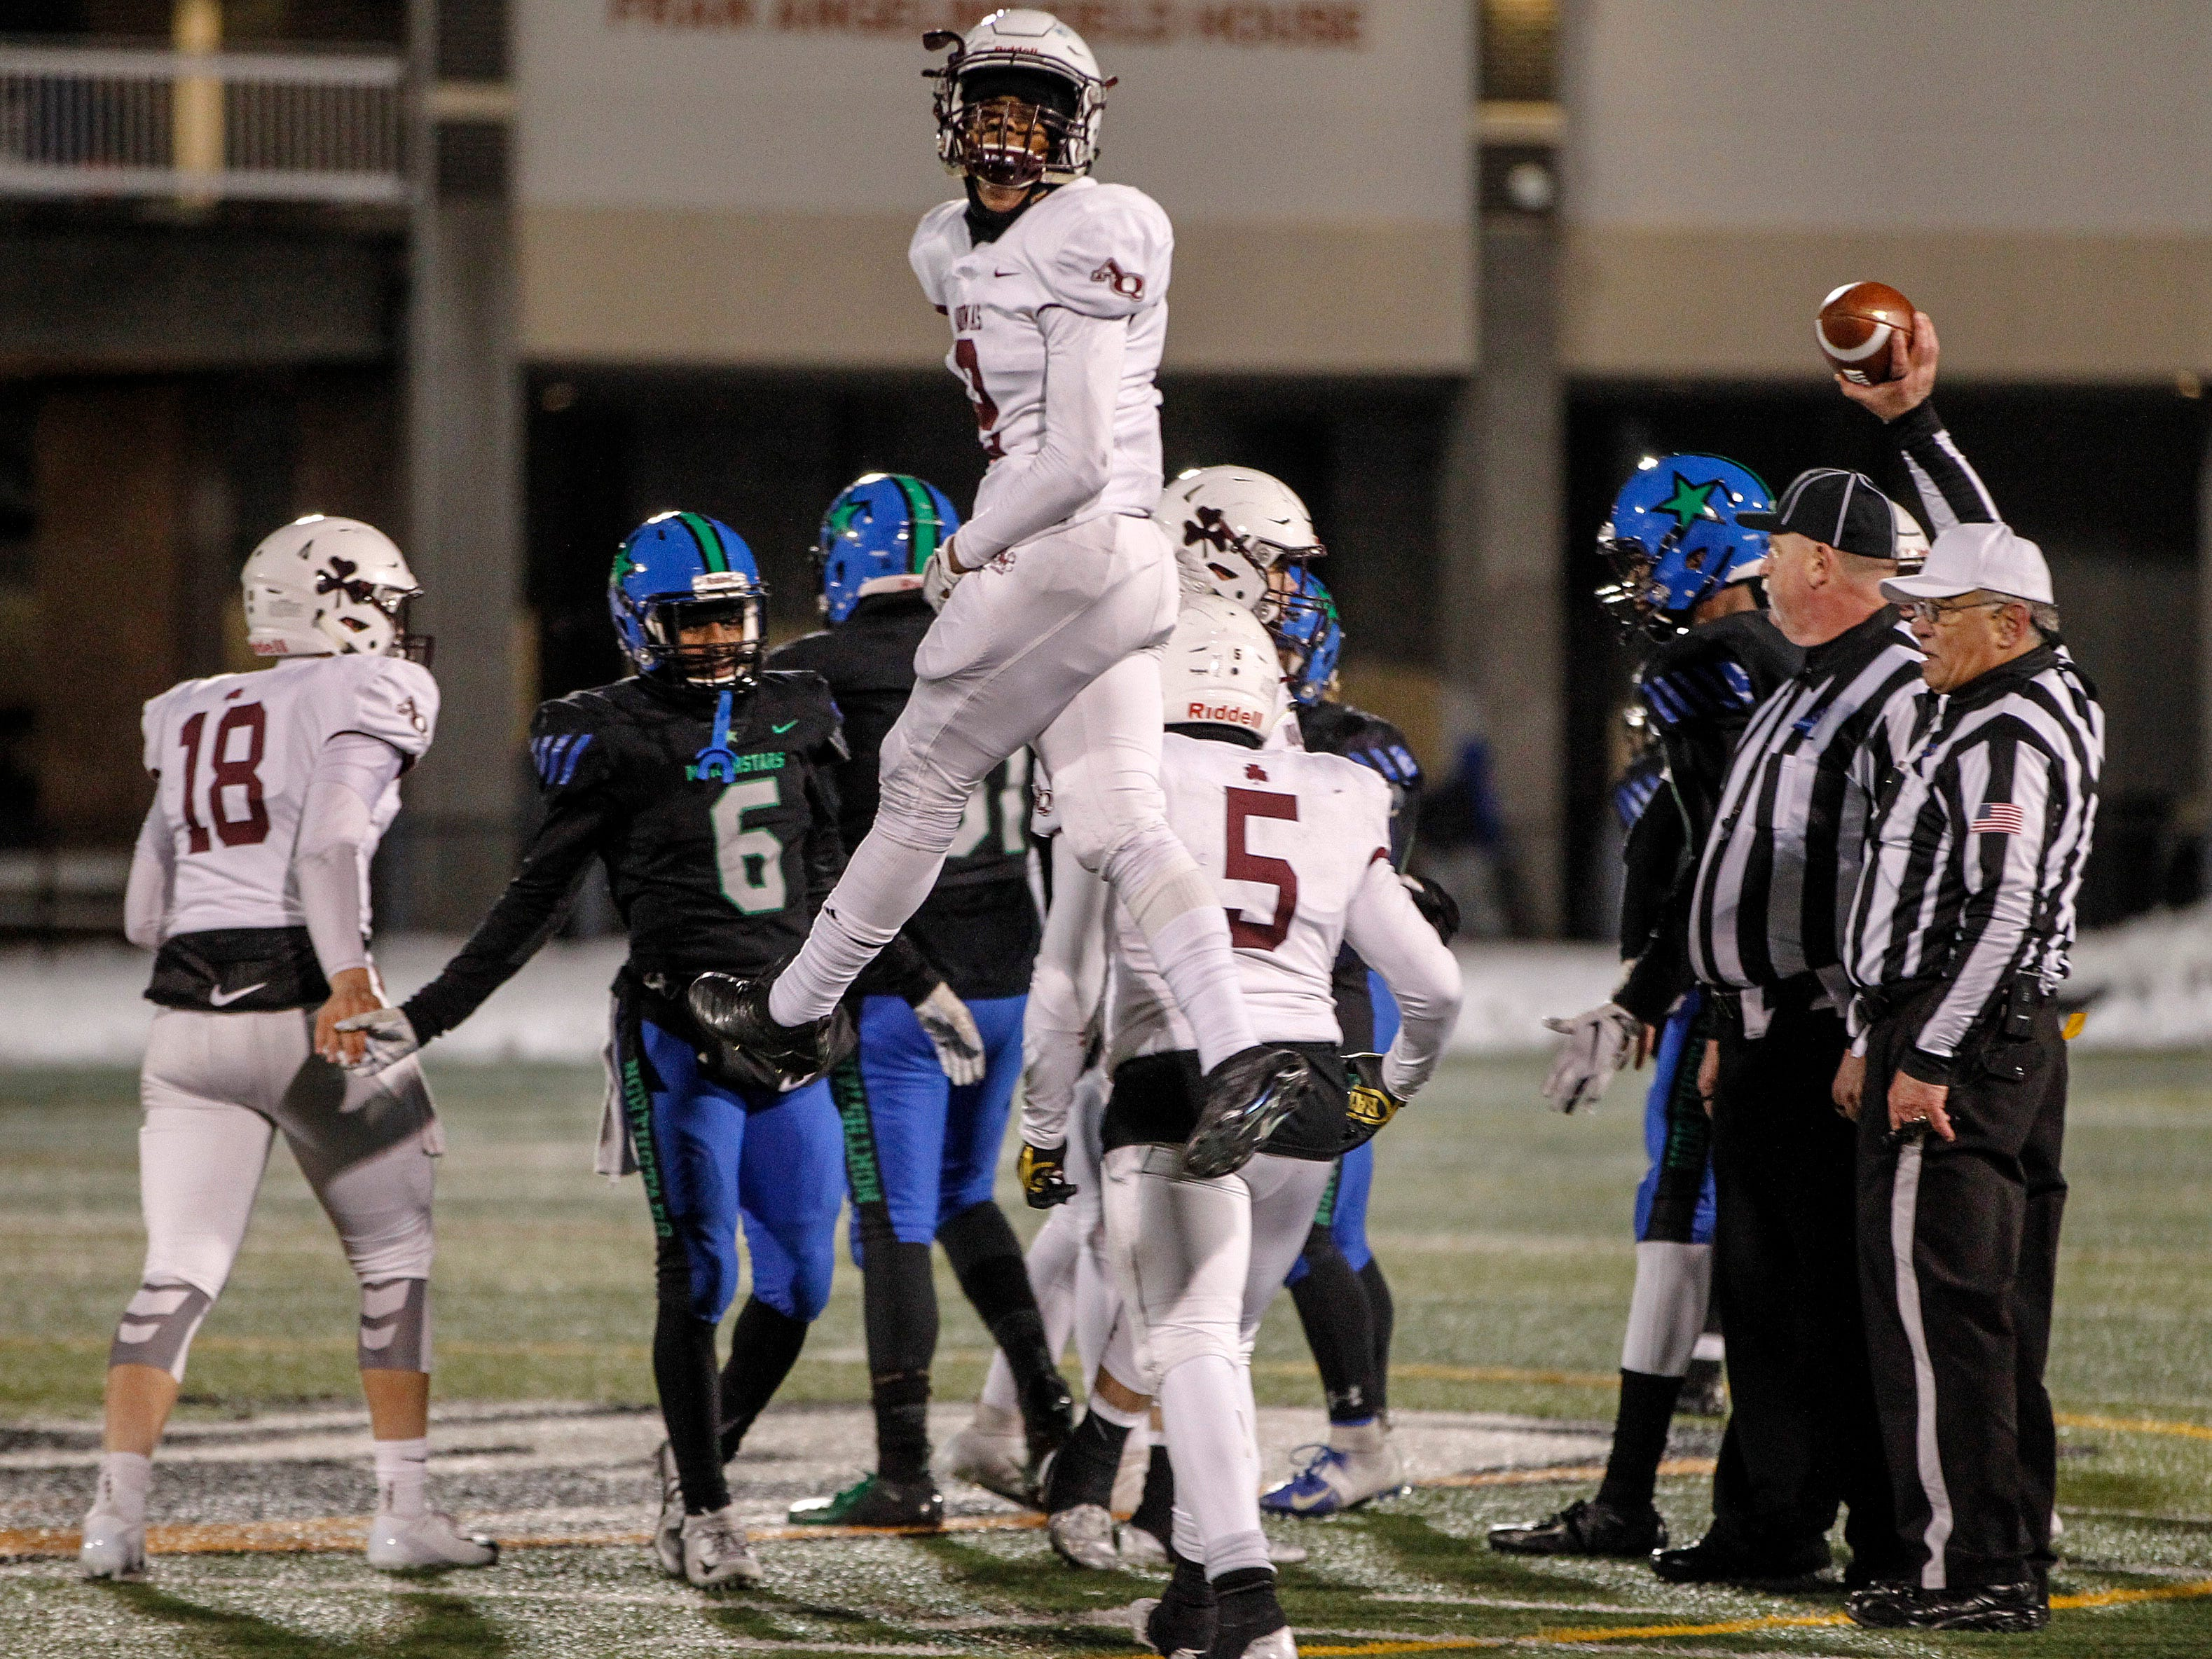 Aquinas' Kobe McNair jumps as he celebrates victory over Cicero-North at Union-Endicott High School during state semifinals. Saturday, November 17, 2018.